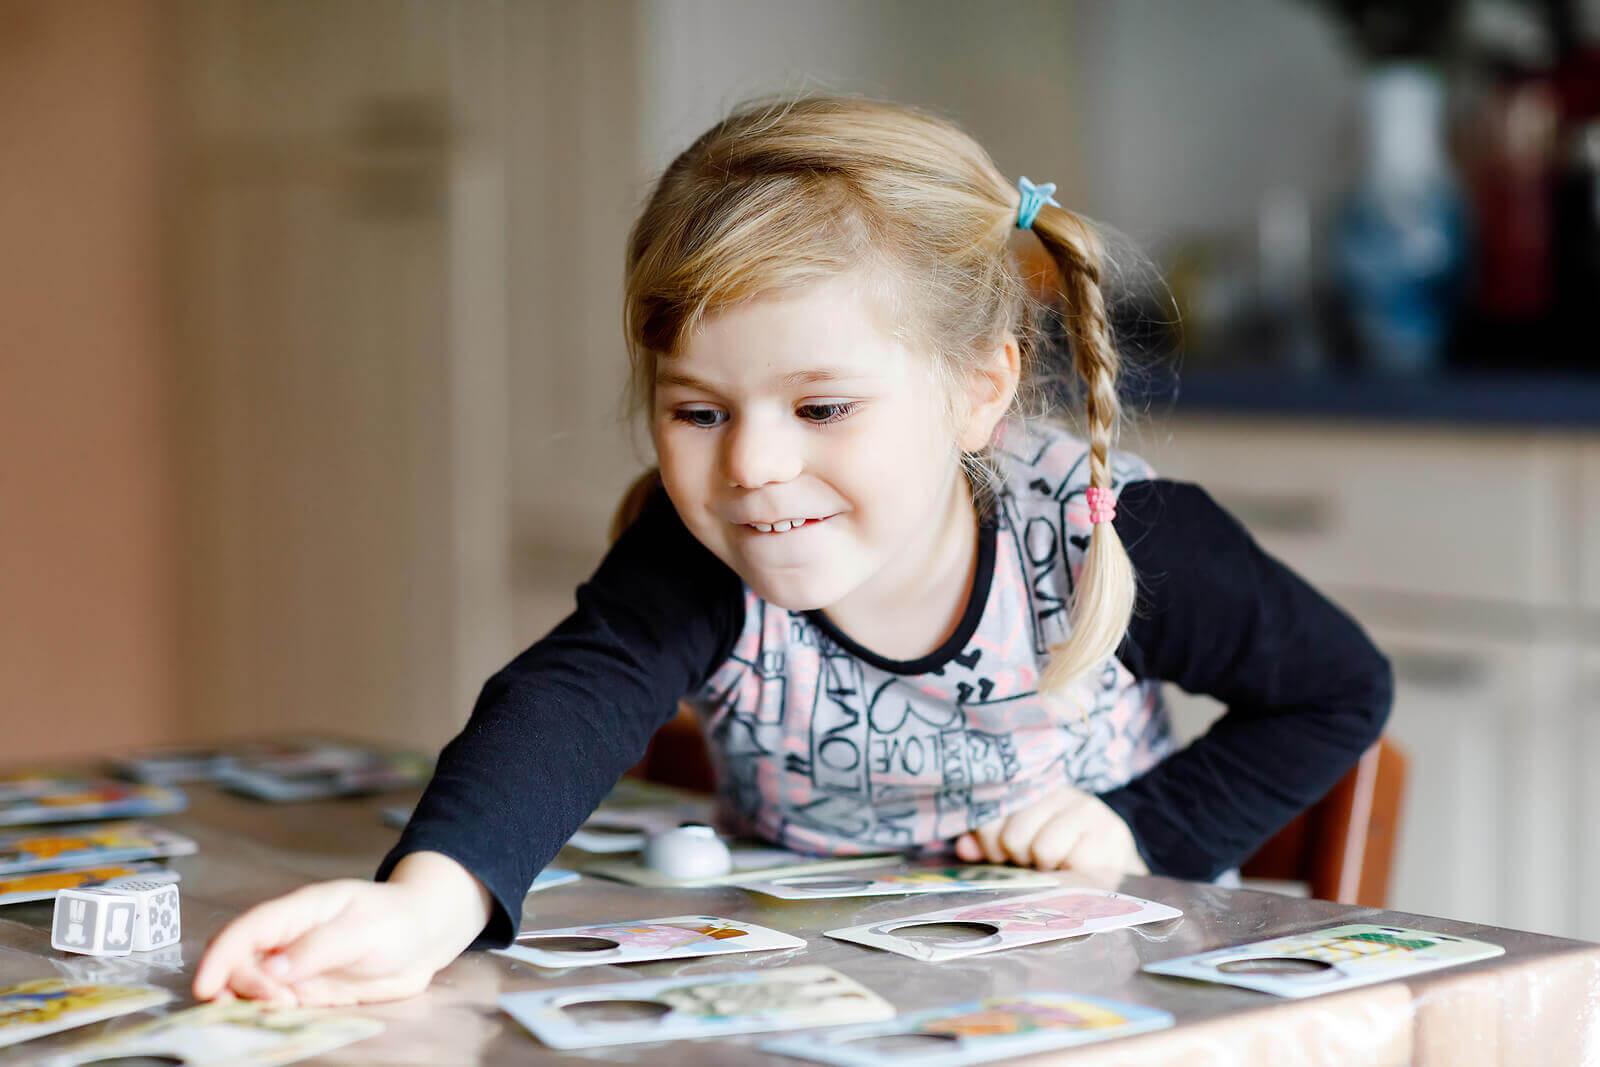 8 Phrases to Strengthen Willpower in Children